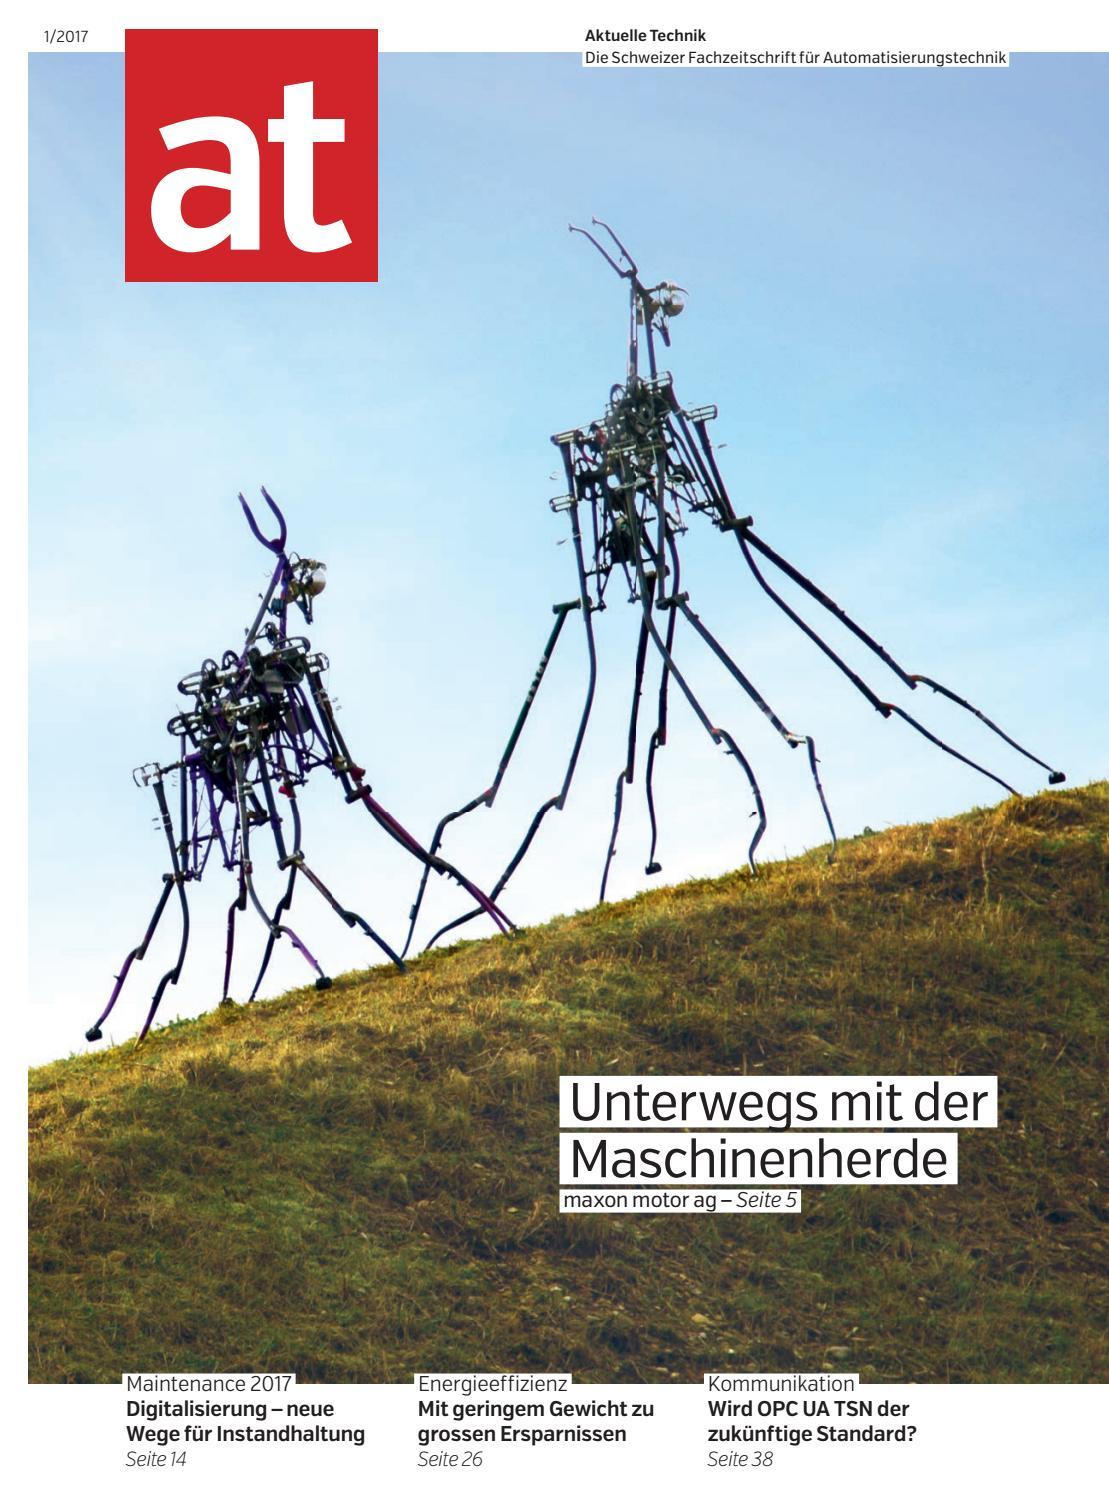 at - Aktuelle Technik 01 2017 by BL Verlag AG - issuu